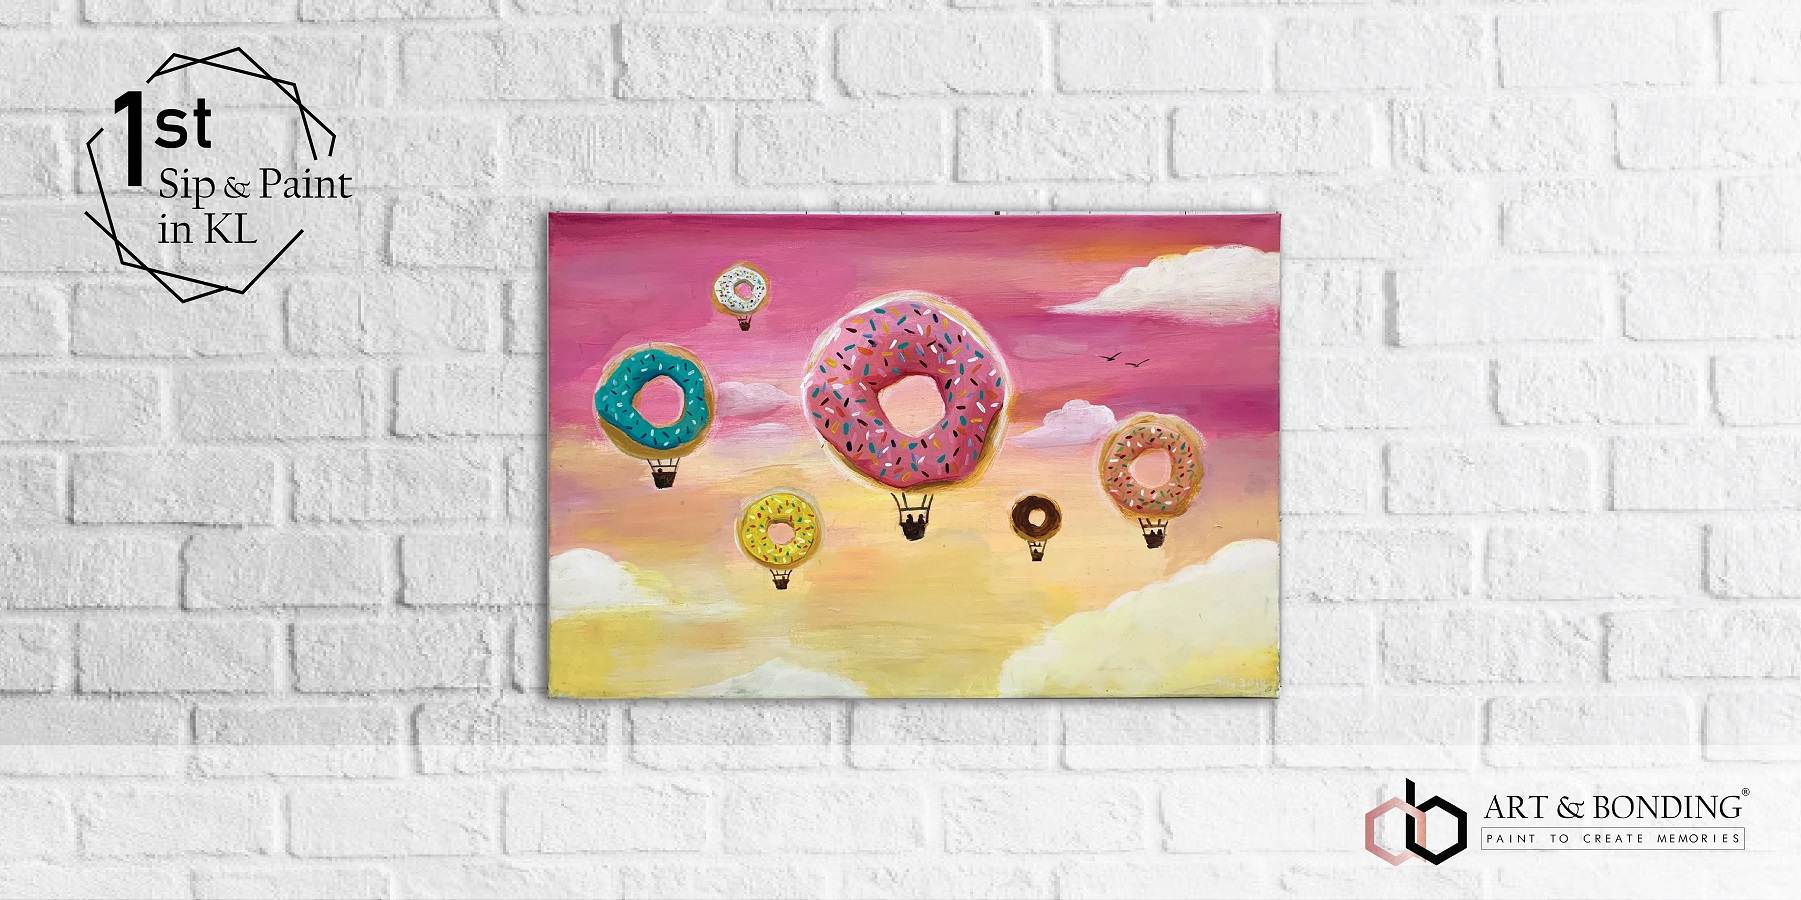 donut-dessert-family-acrylic-activiy-familygoals-sunday-food-bonding-art-02